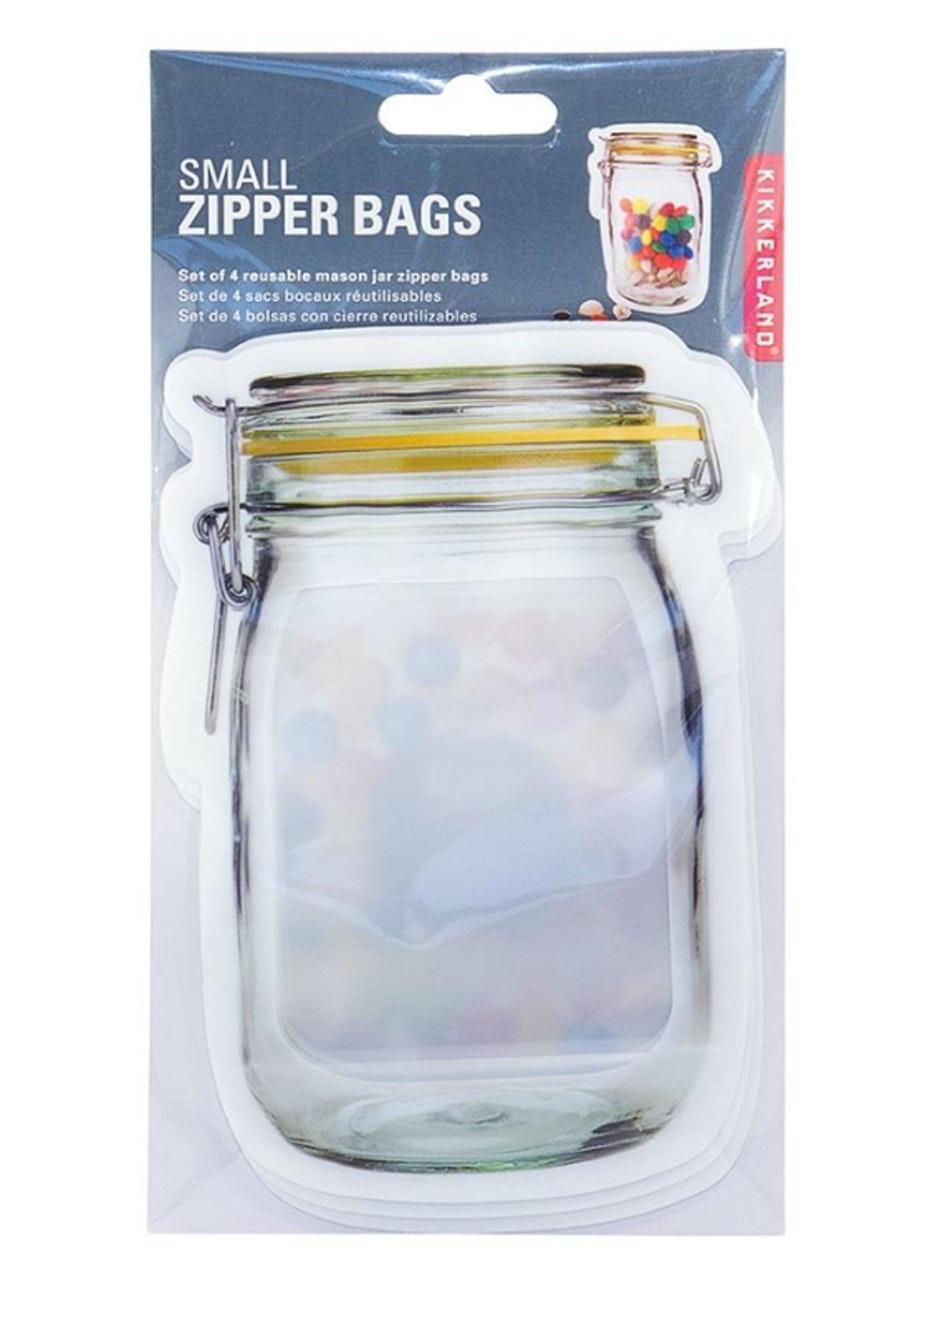 Zipper Bags - Small - Set of 4